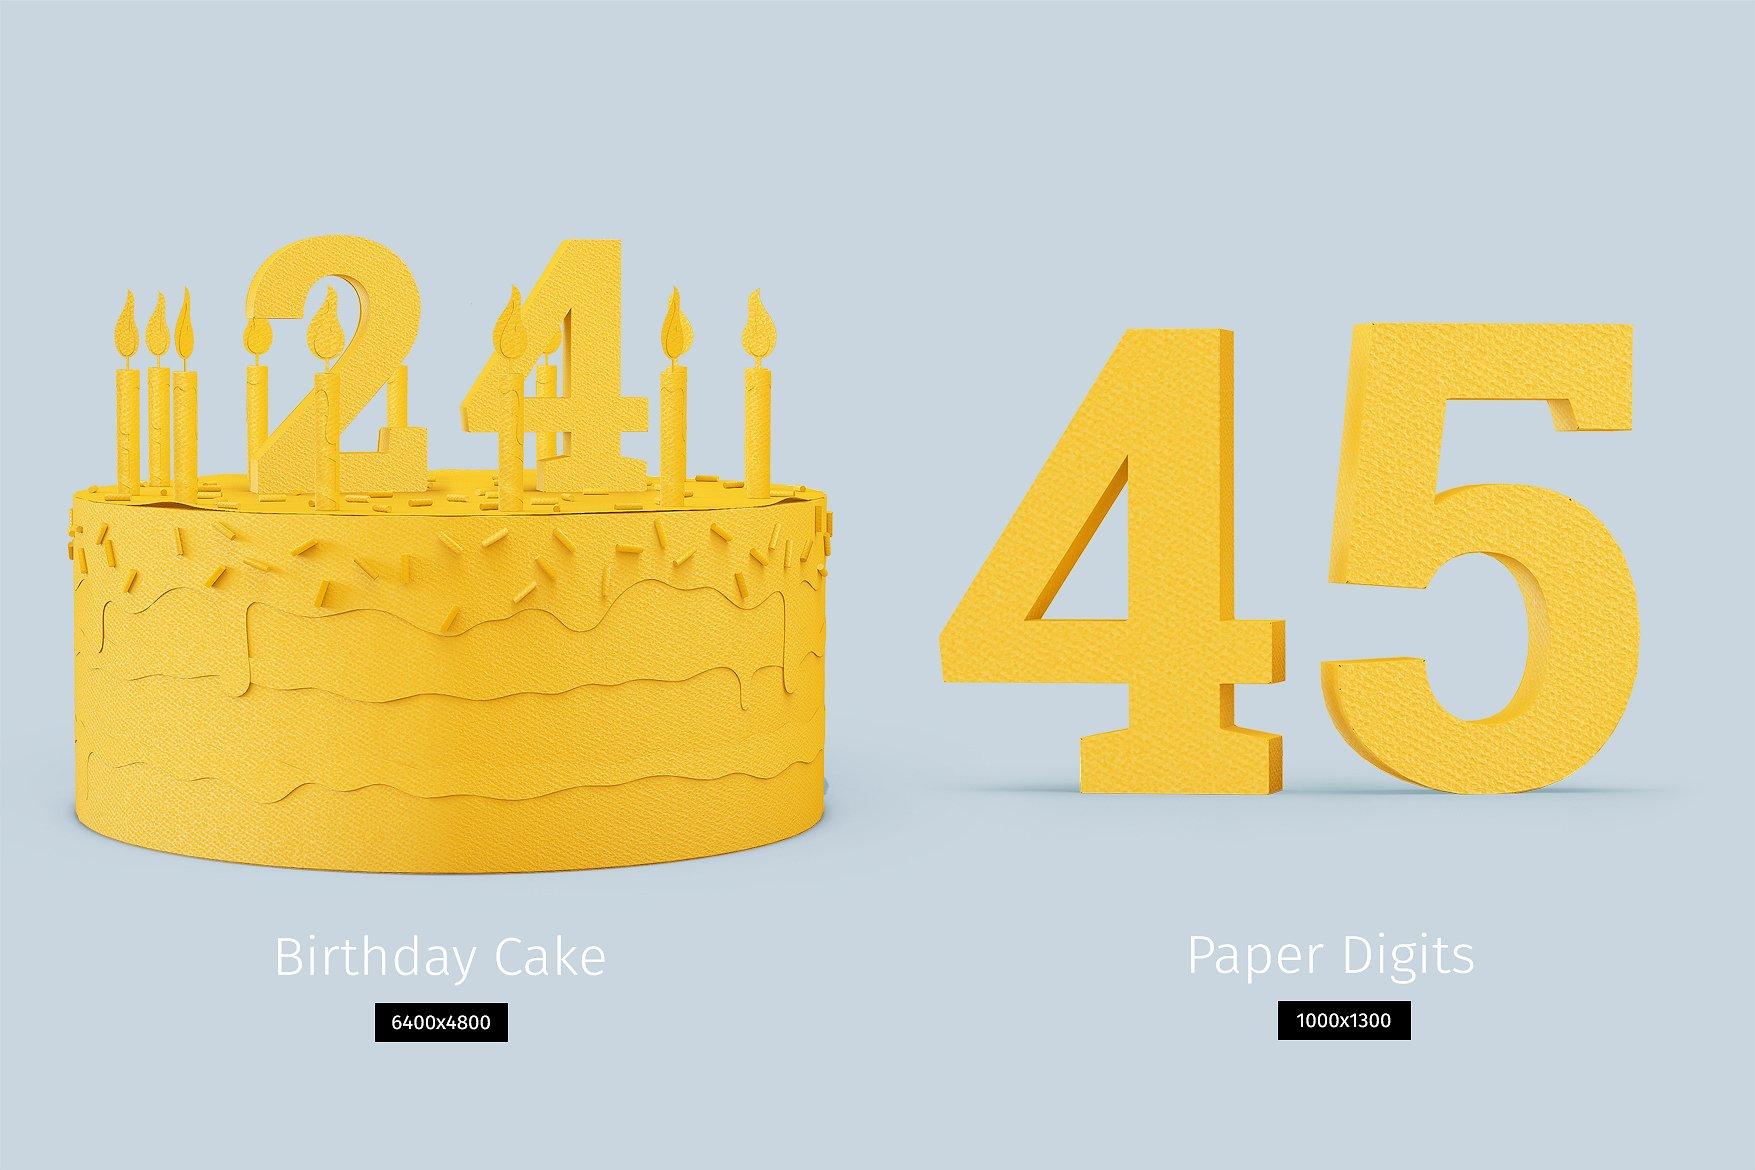 Papercraft Birthday Cake example image 2